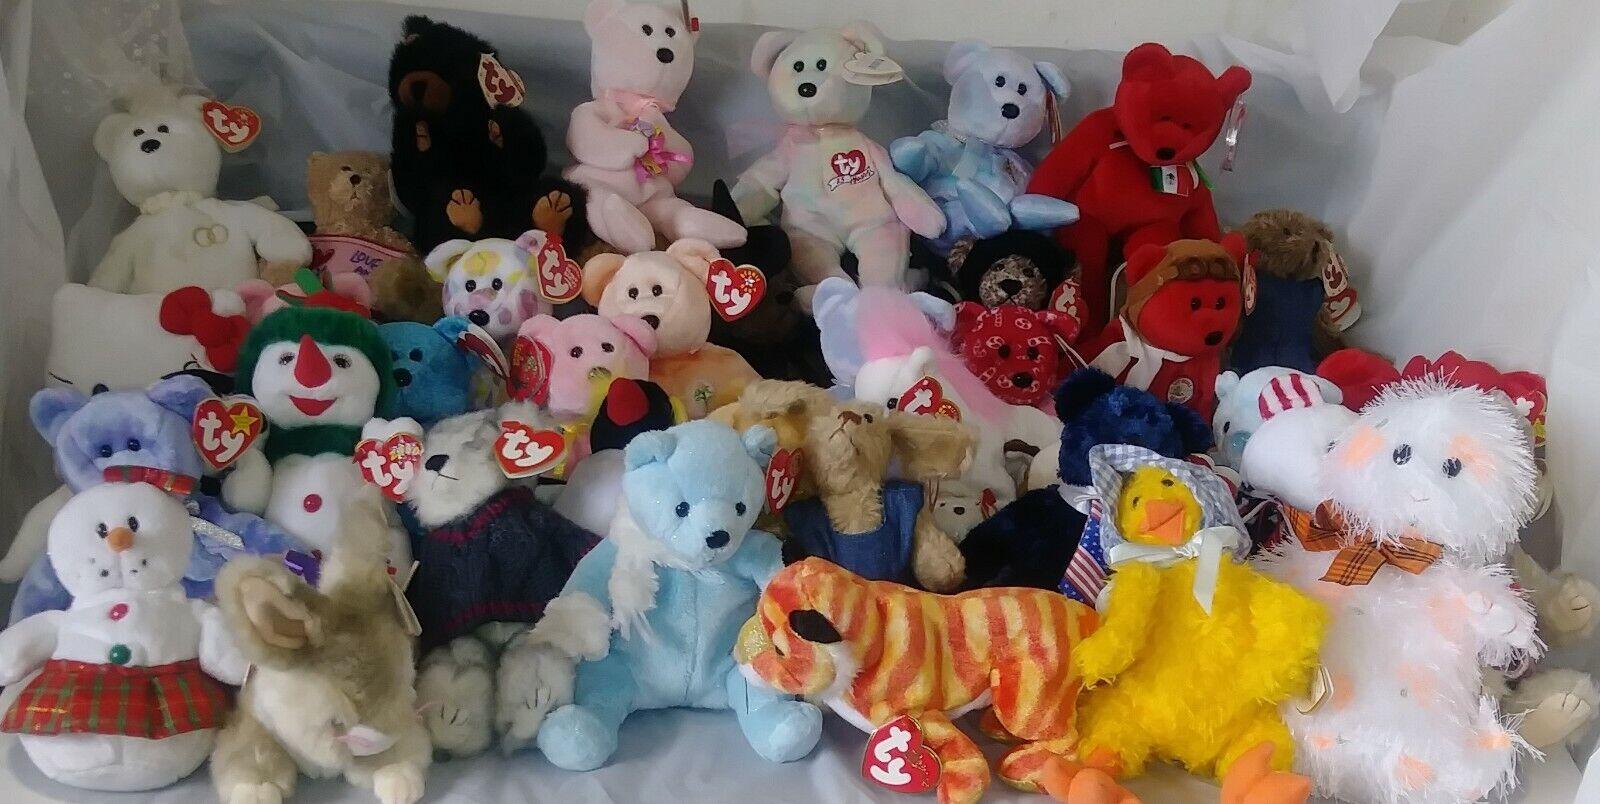 Un montón de bebés tabini, bebés, tesoros del desván, amigos de Tai.